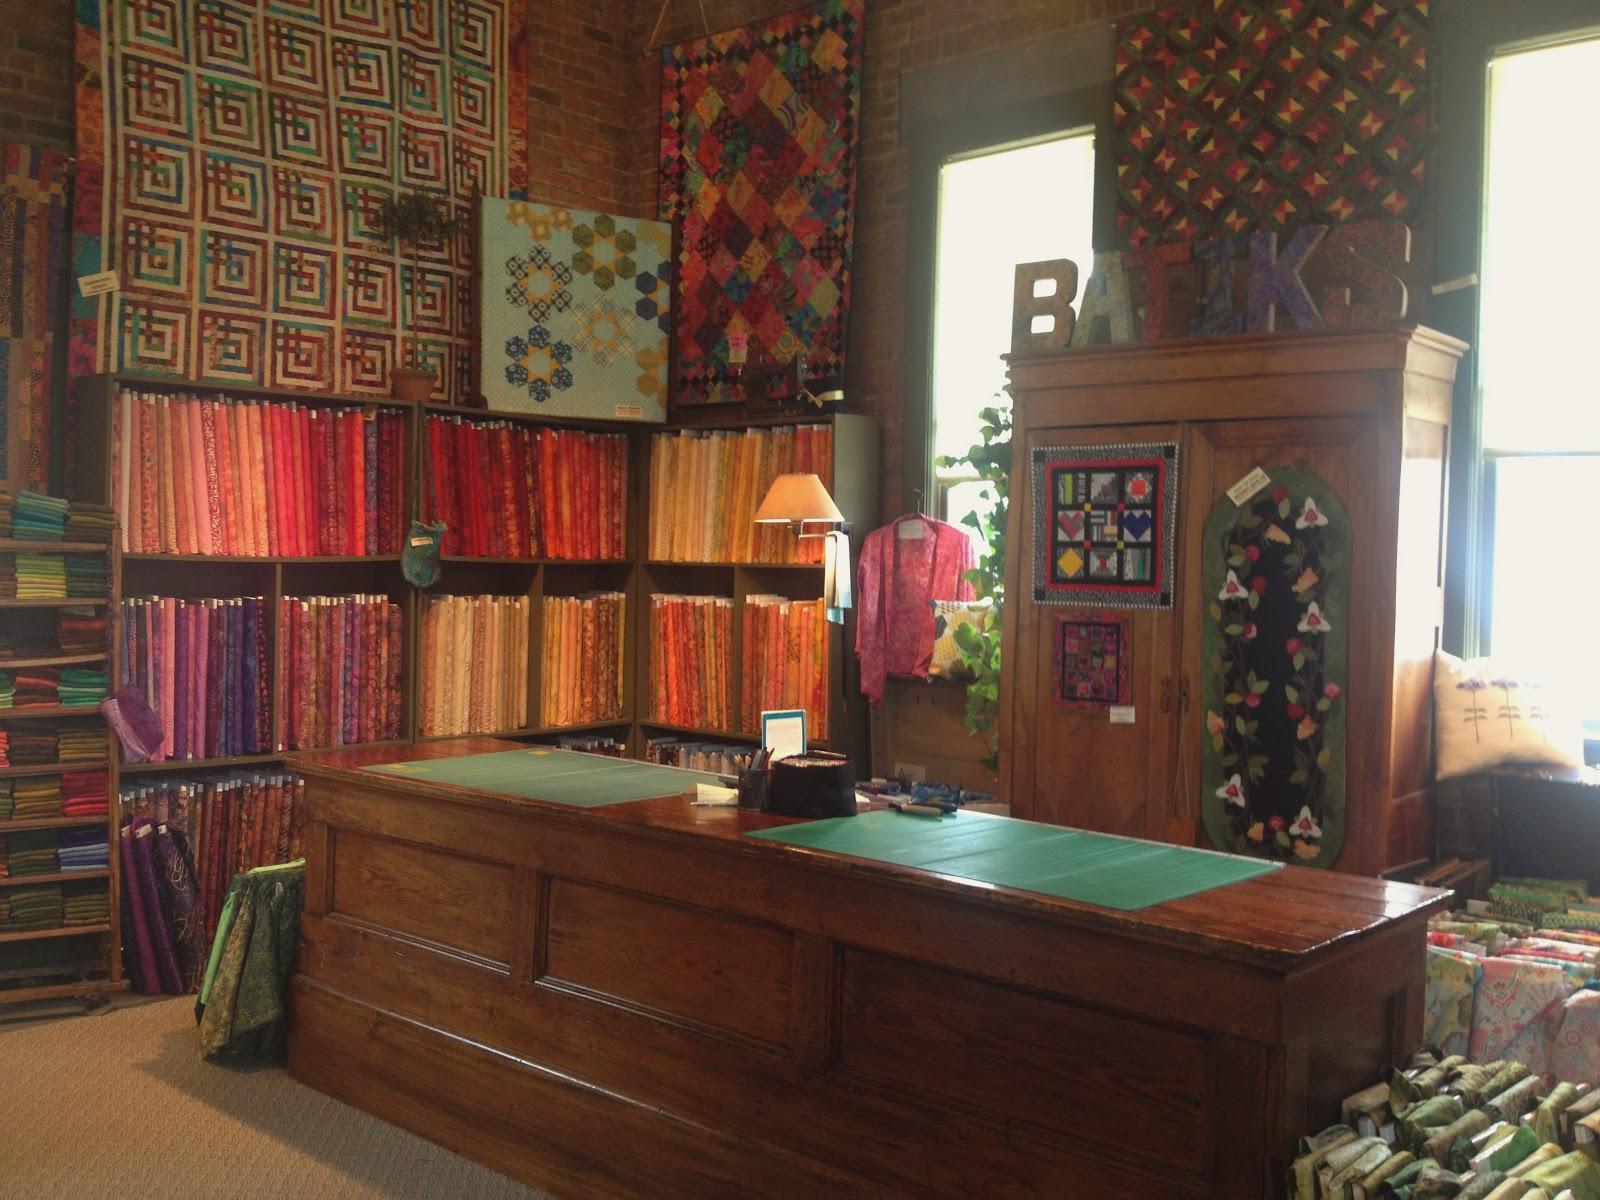 Eagle Creek Quilt Shop in Shakopee, Minnesota